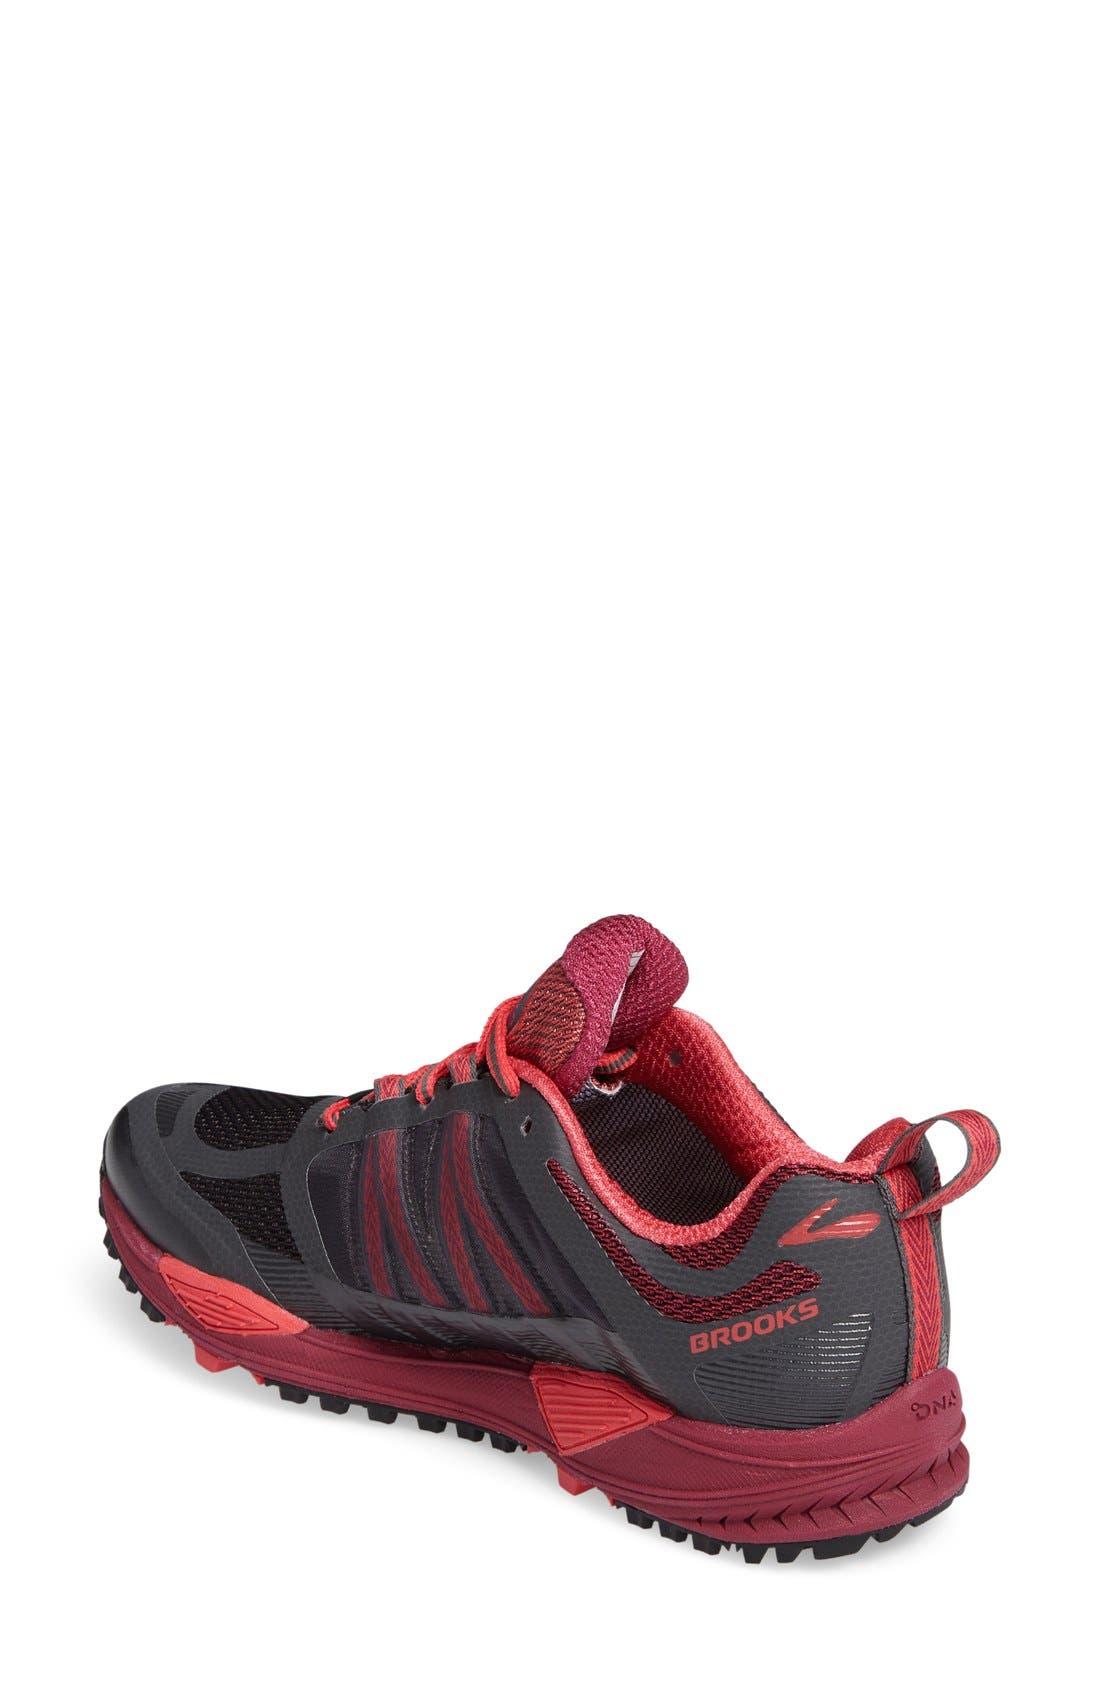 Alternate Image 2  - Brooks Cascadia 11 GTX Trail Running Shoe (Women)